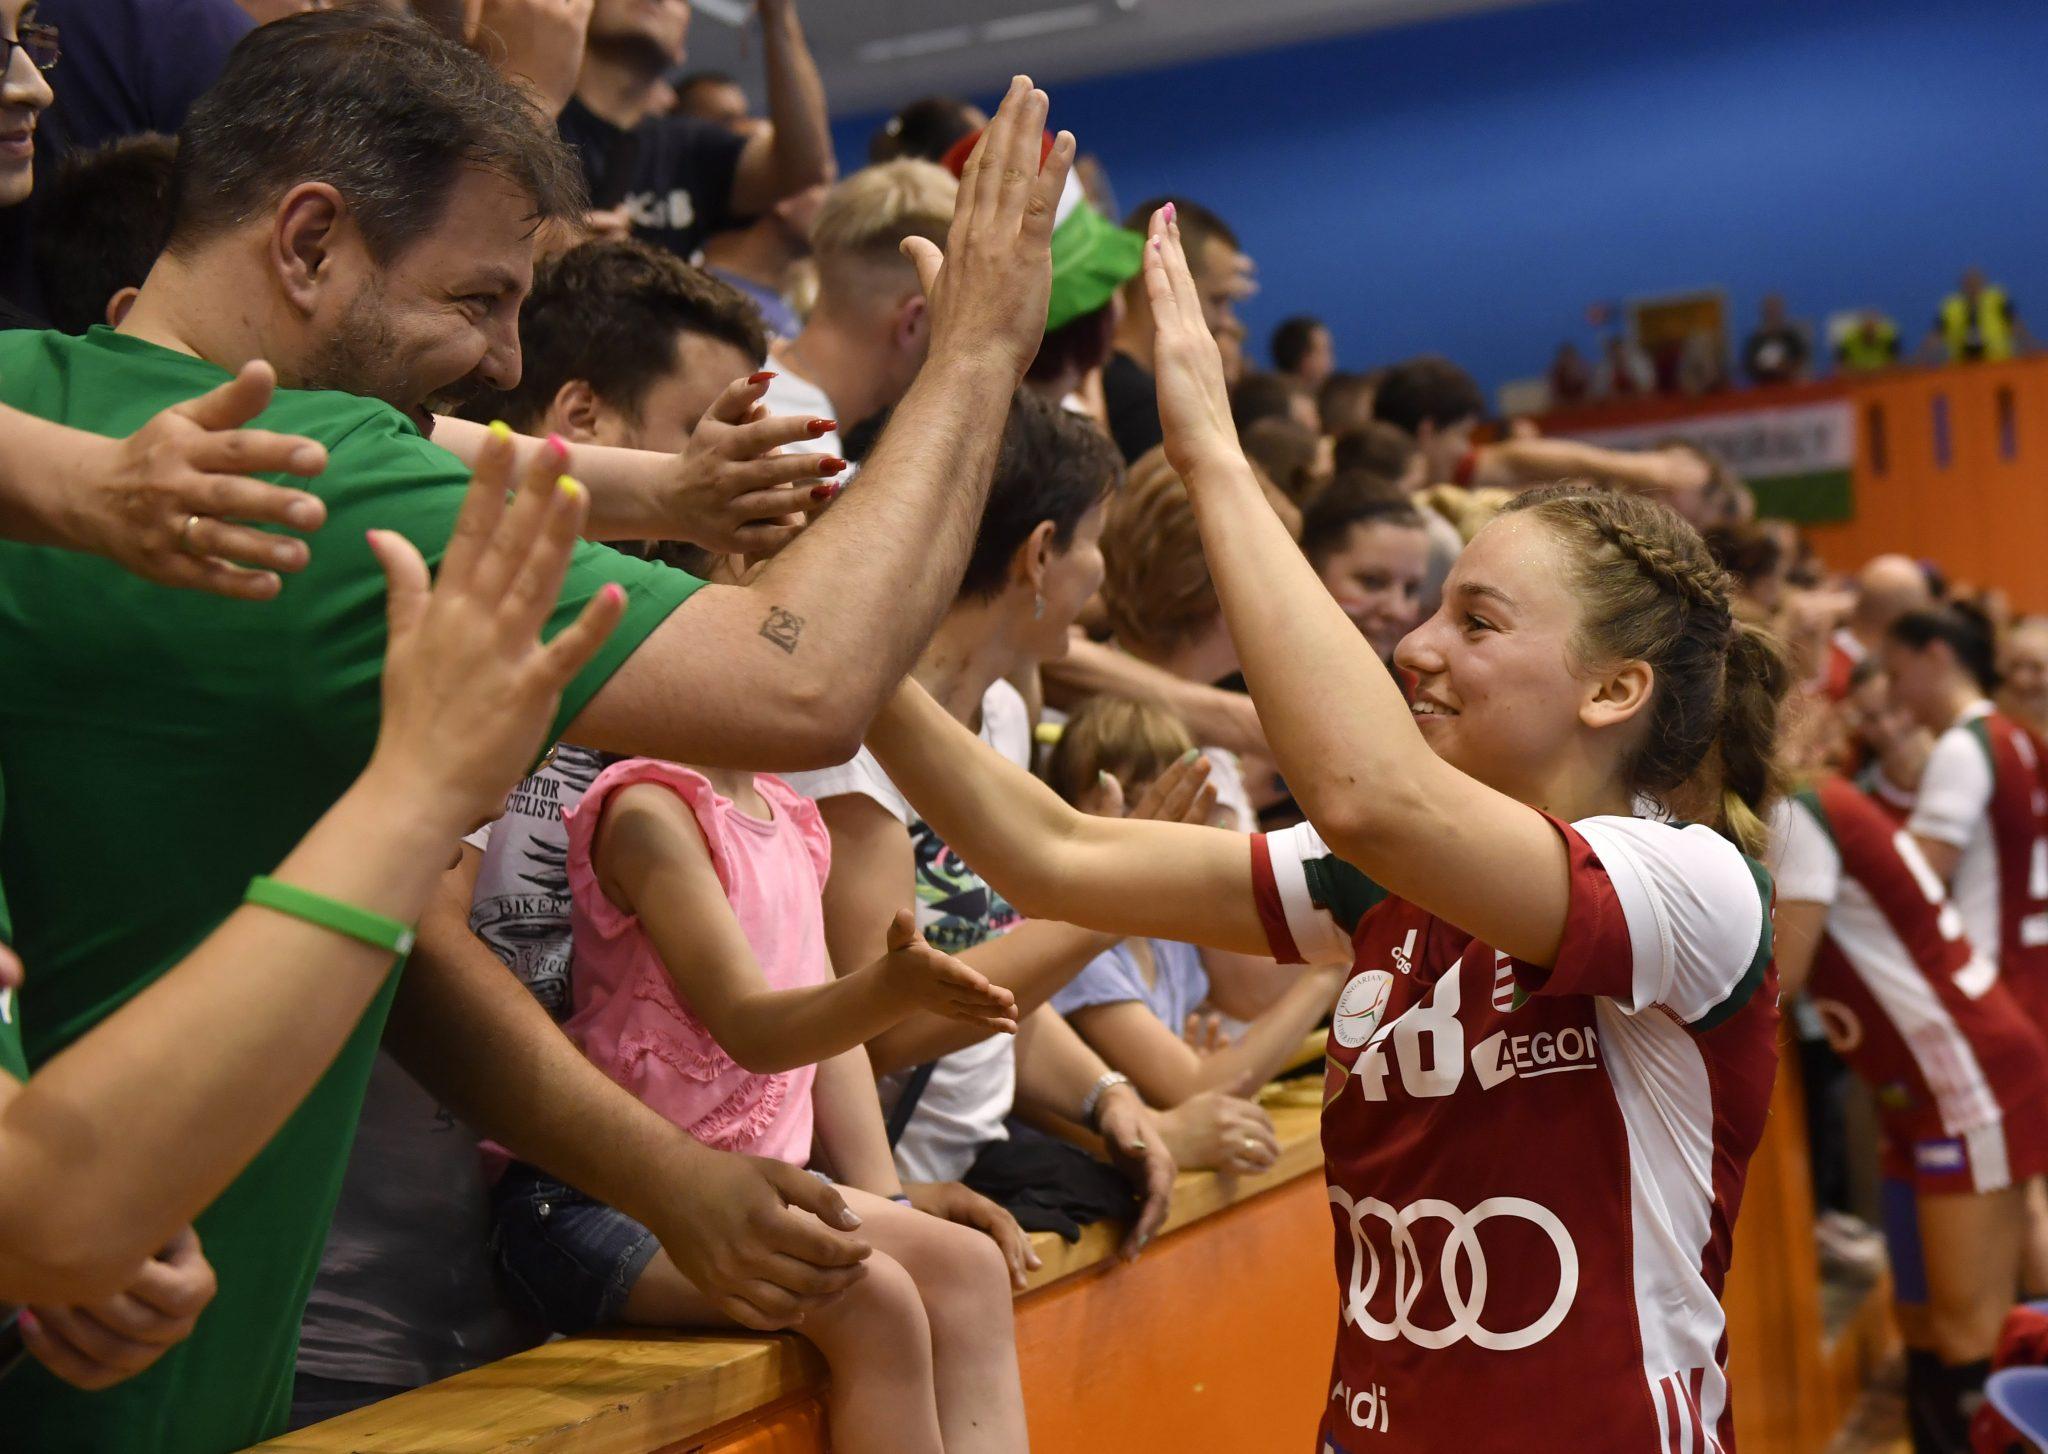 Hungary to Host 2027 World Women's Handball Championship post's picture